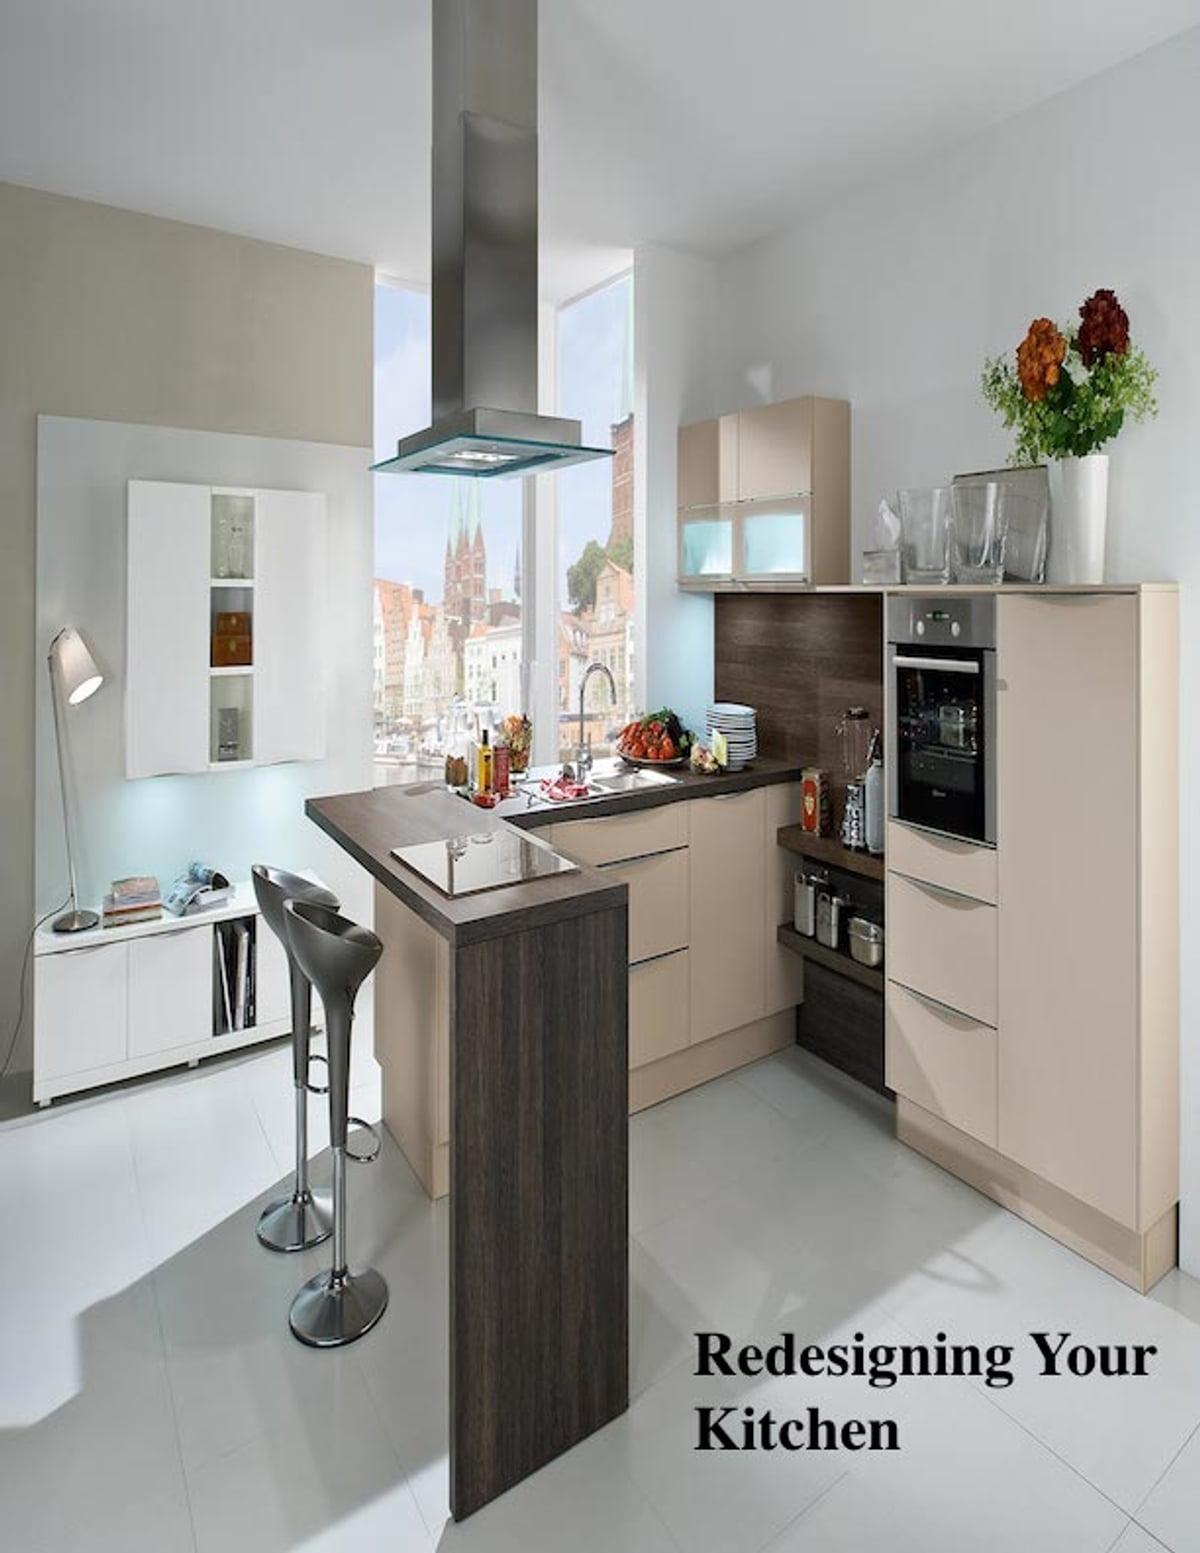 redesigning a kitchen semi custom cabinets your ebook di v t 1230000231639 rakuten kobo